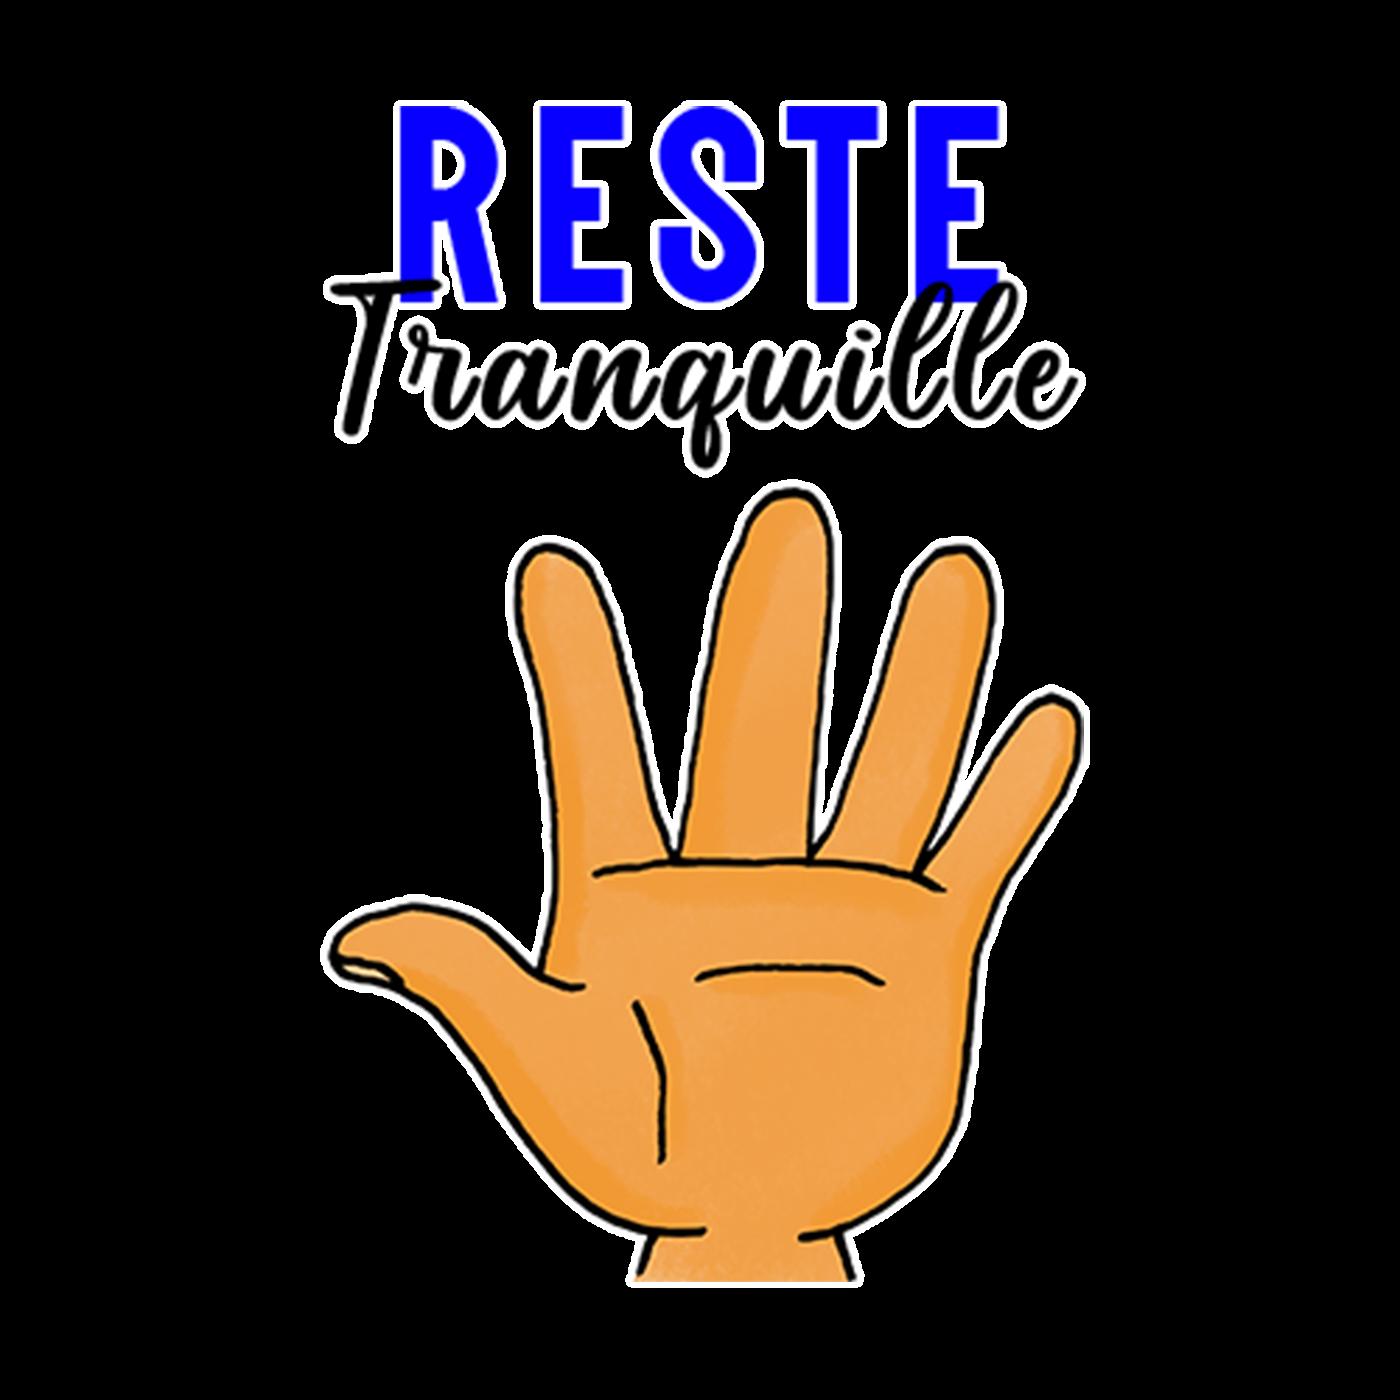 Reste Tranquille - Mer. 6 Jan. 2021